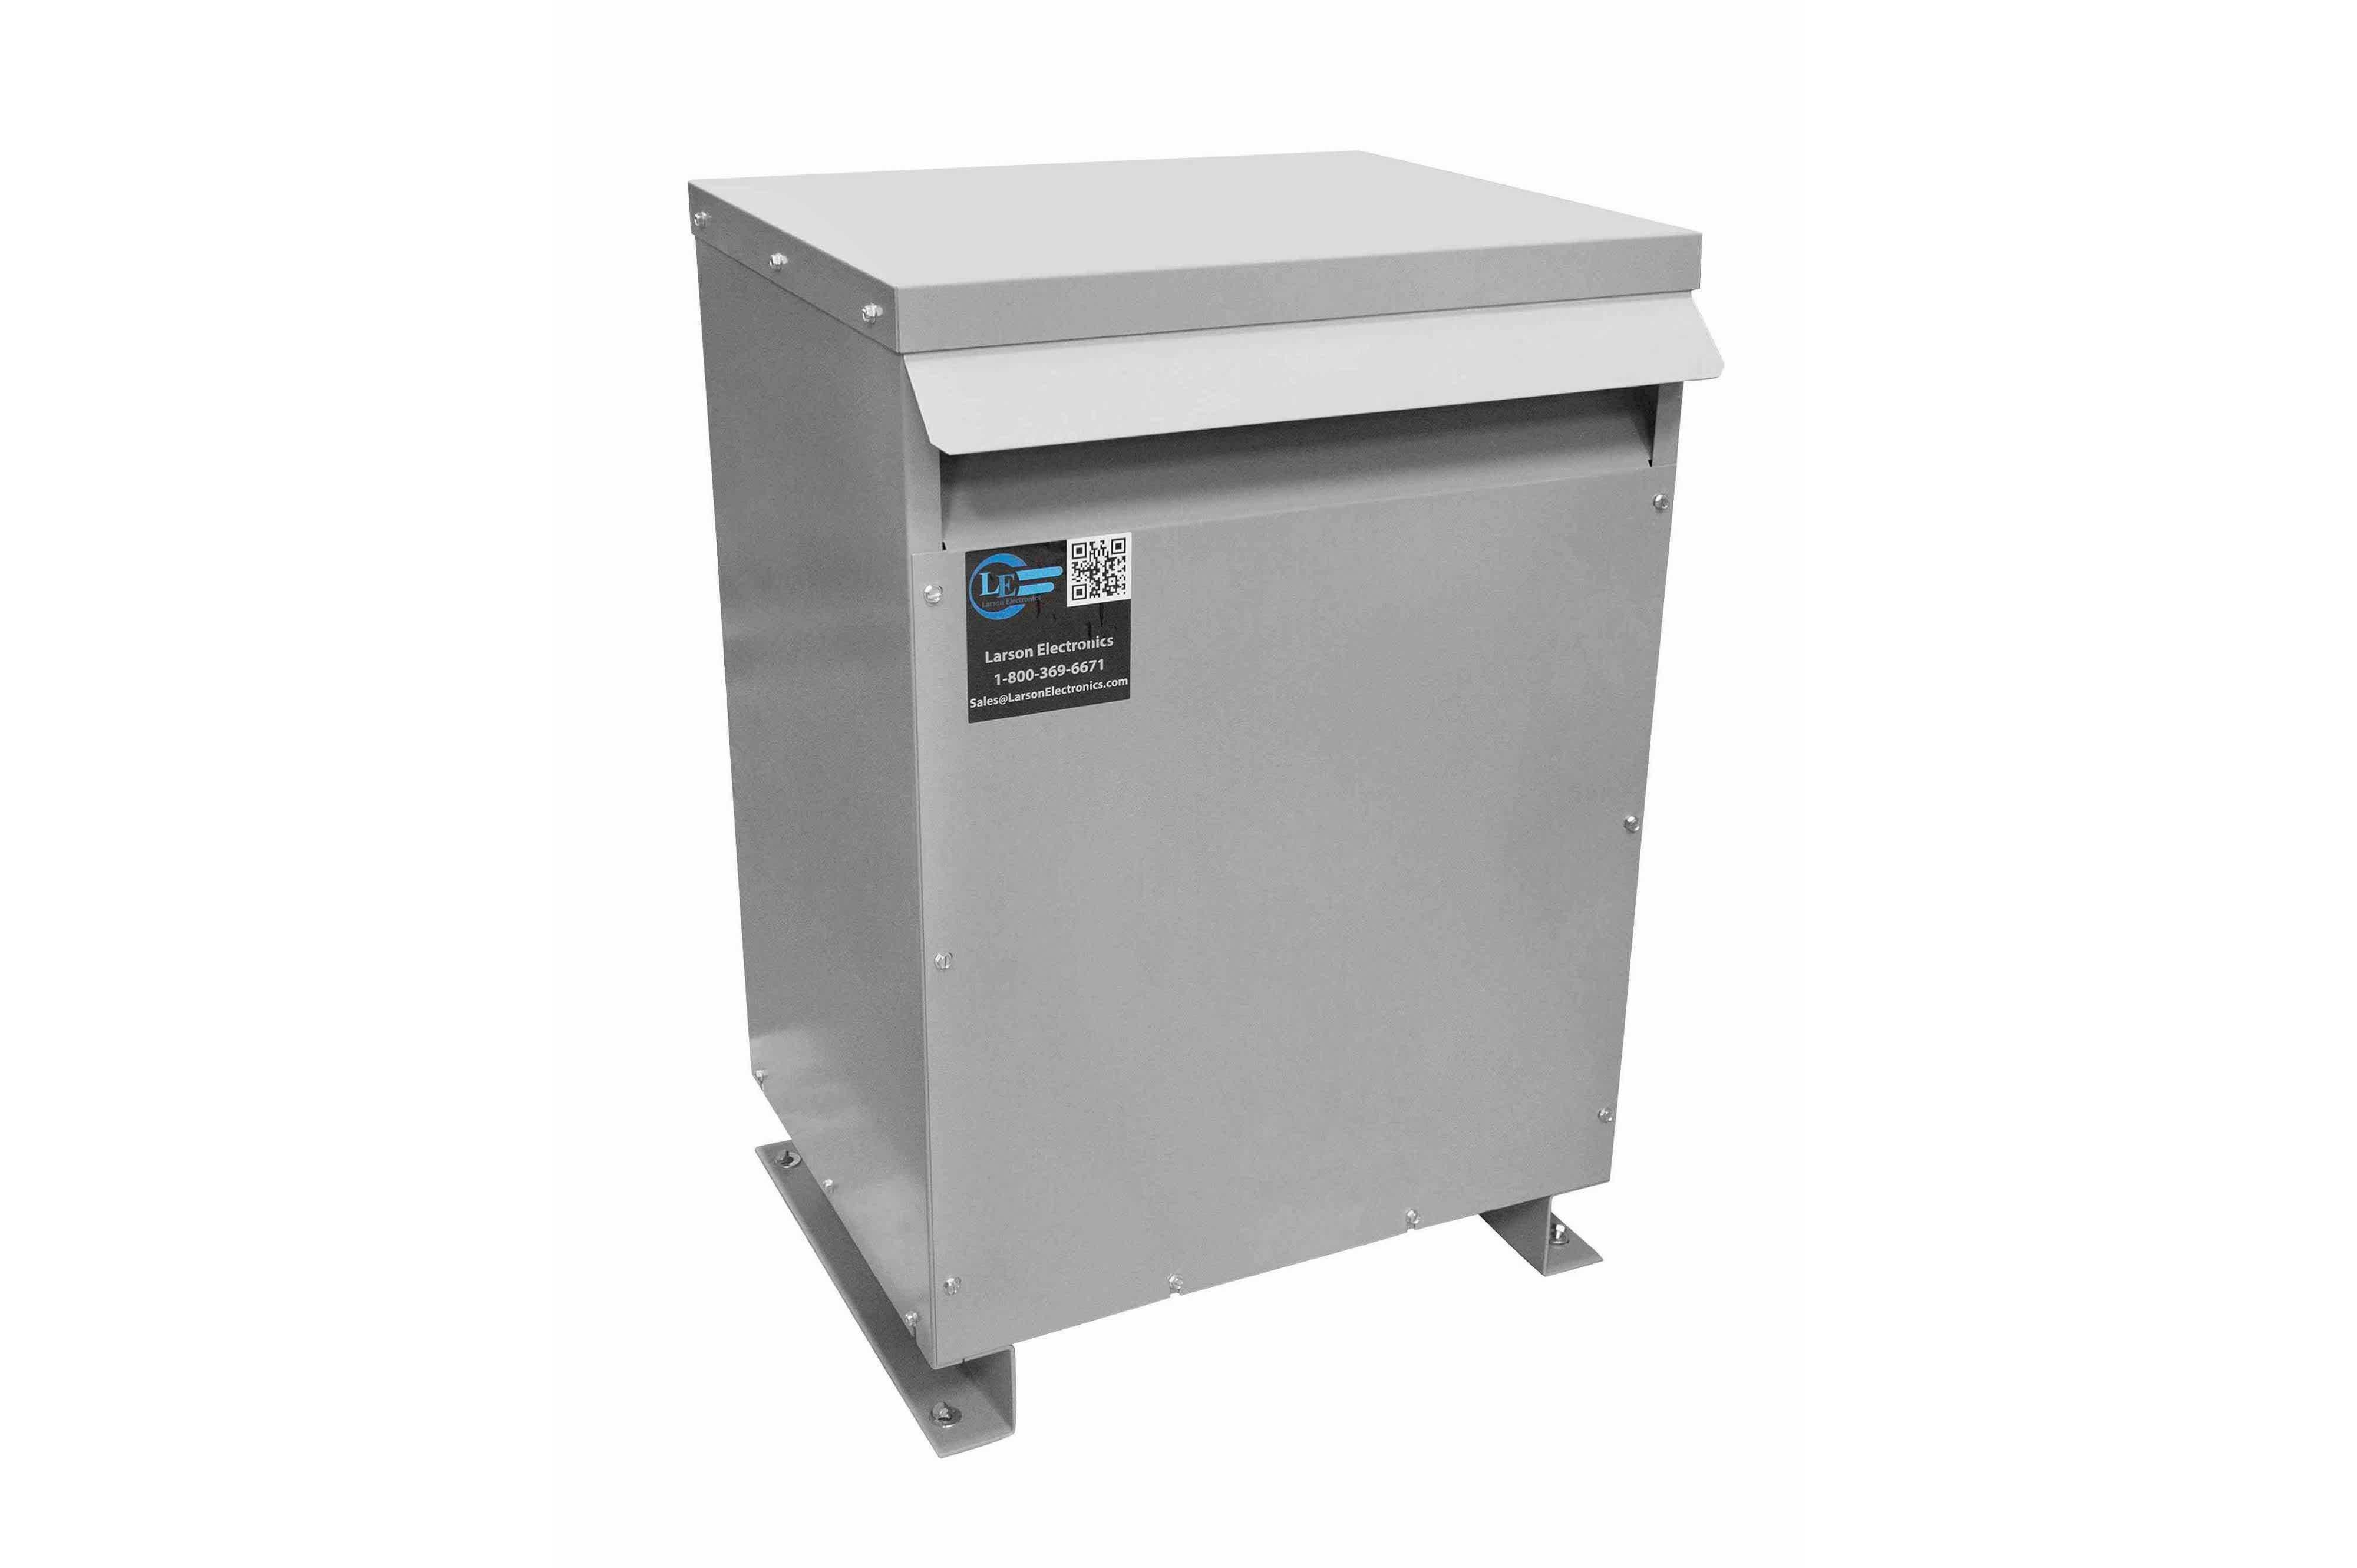 90 kVA 3PH Isolation Transformer, 240V Wye Primary, 480Y/277 Wye-N Secondary, N3R, Ventilated, 60 Hz